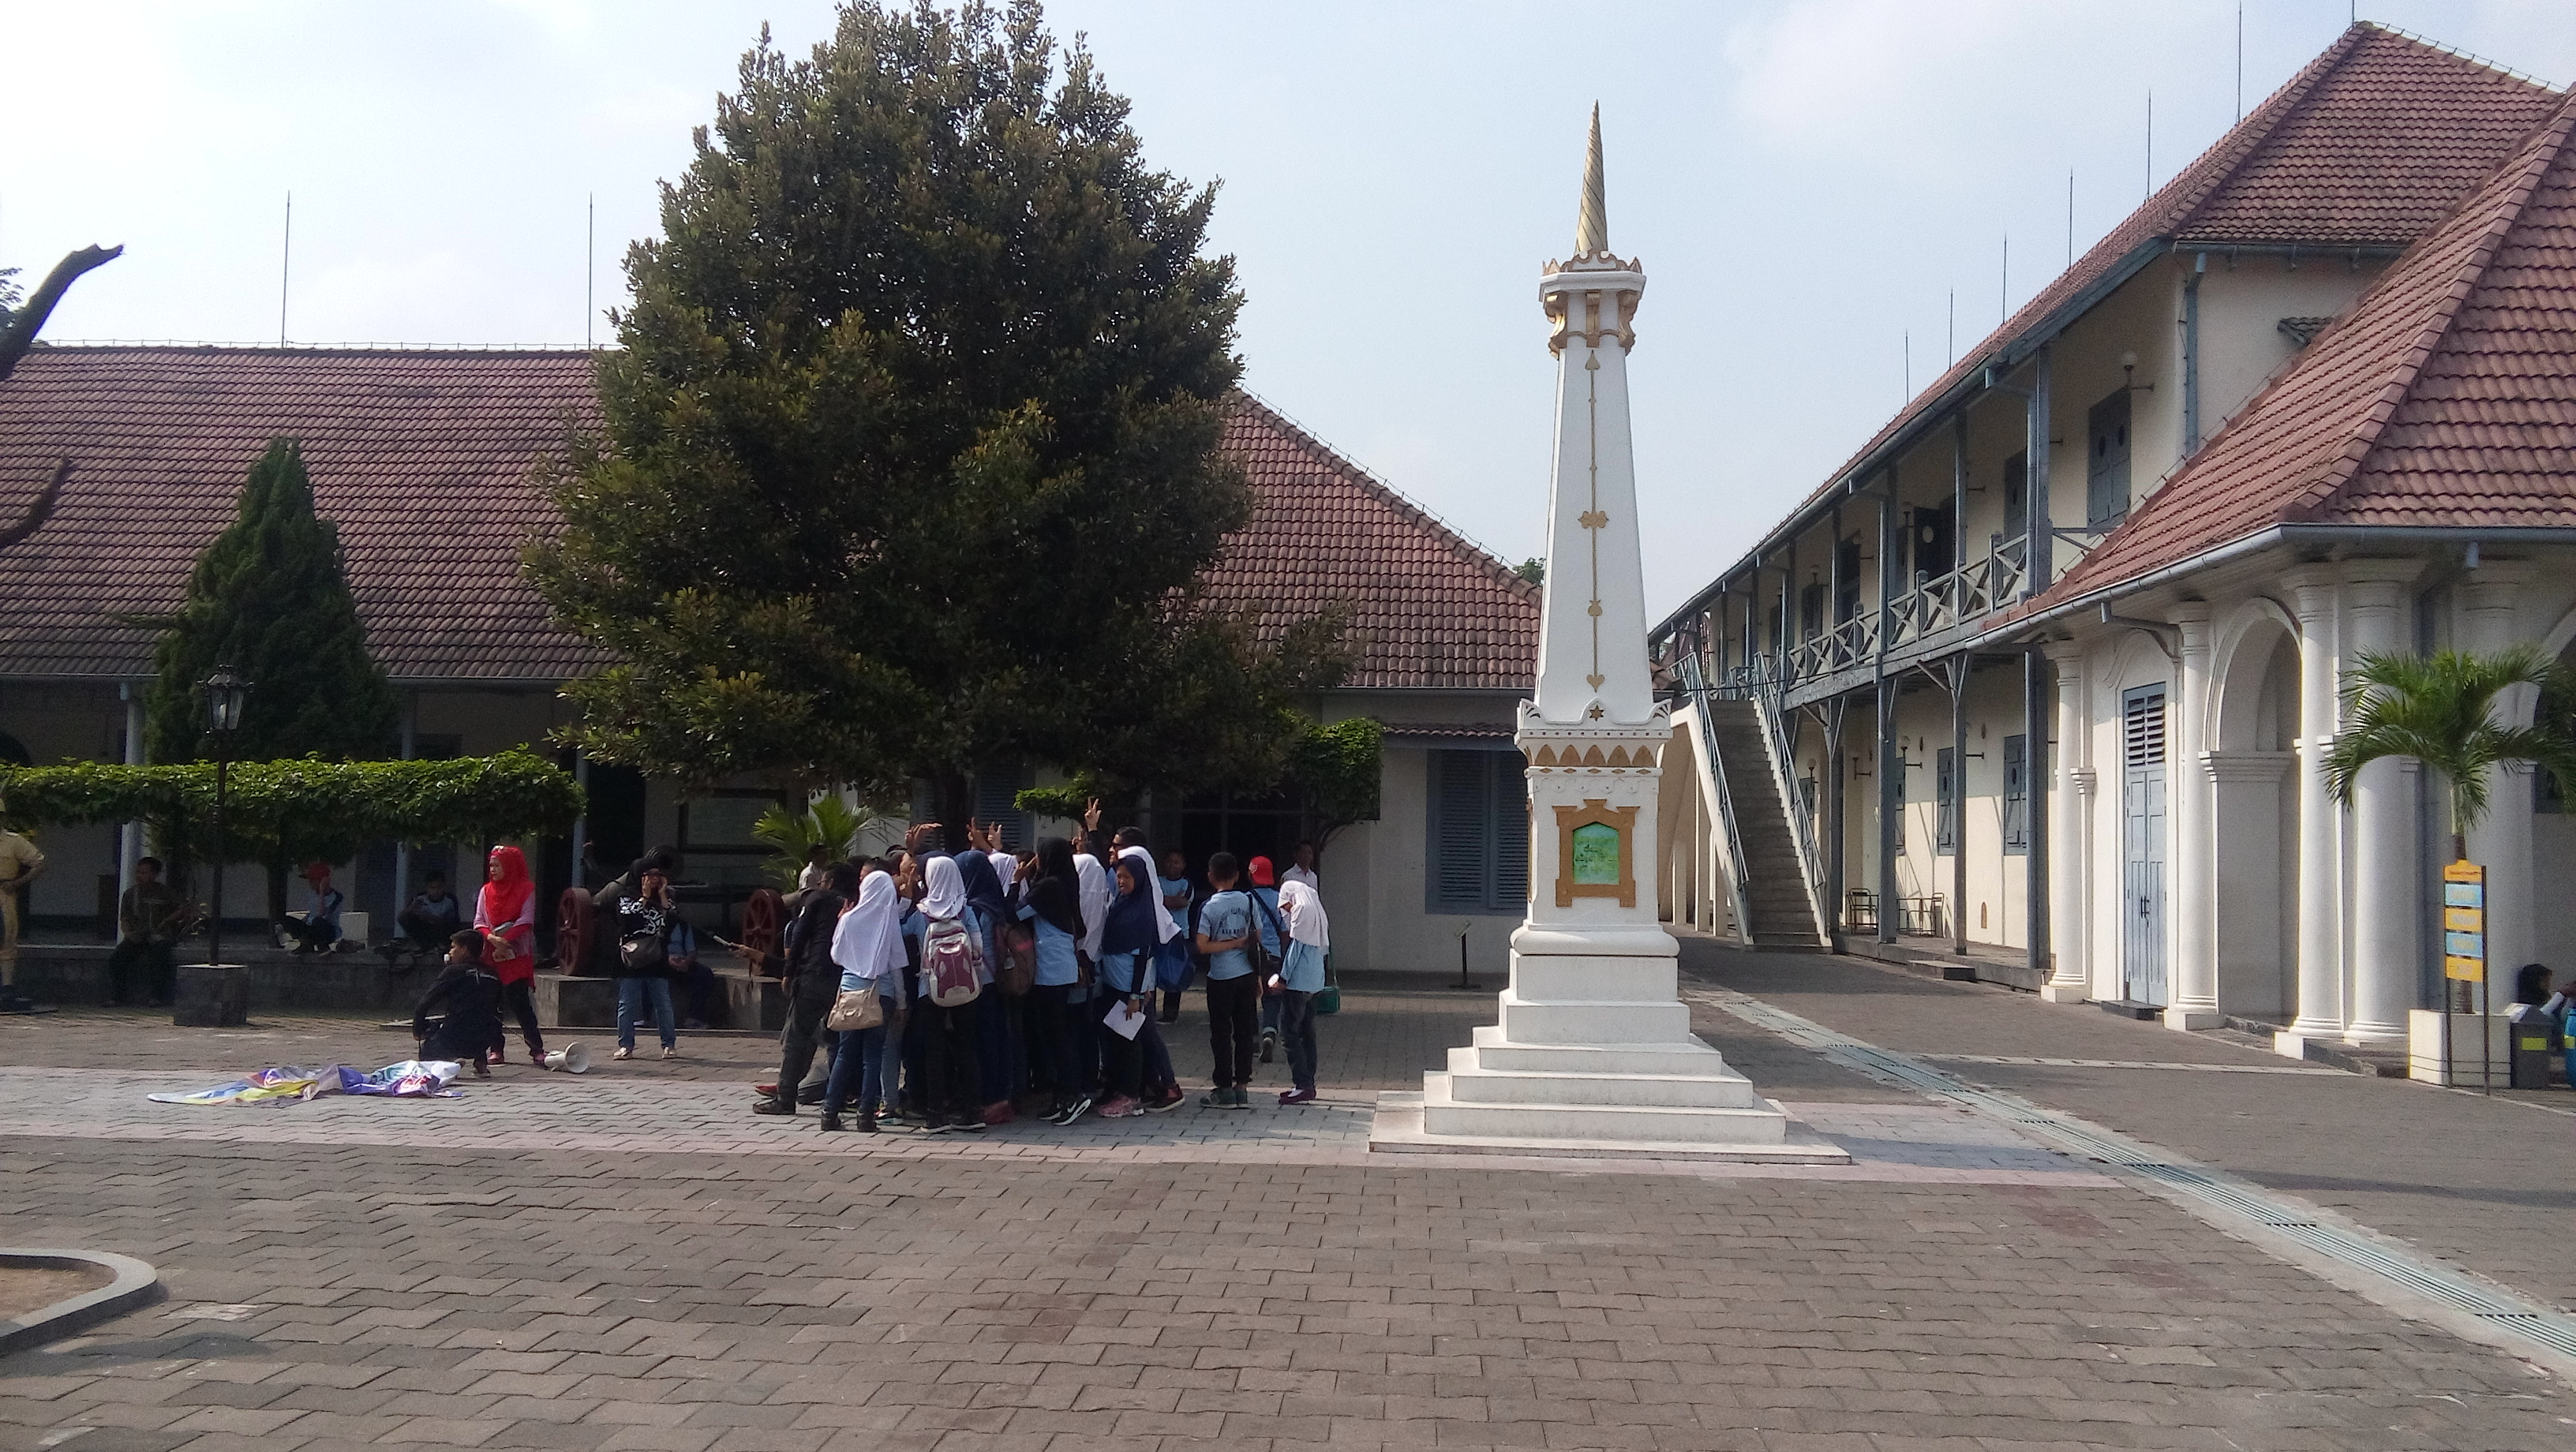 Pengunjung Museum Benteng Vredeburg Yogyakarta Ramai Awal 2016 Kunjungan Kota